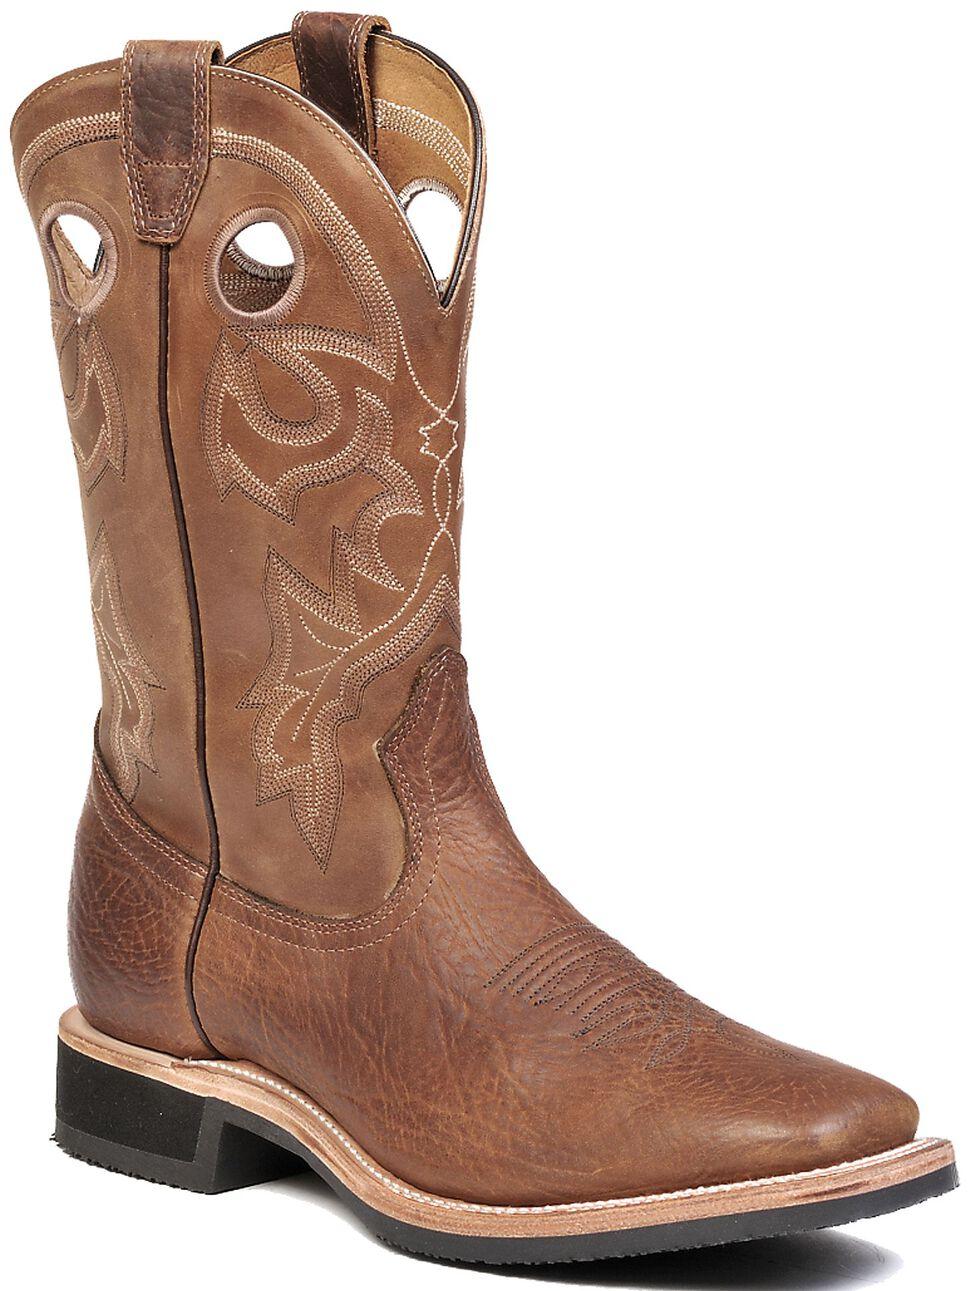 Boulet Cowboy Boots - Square Toe, Brown, hi-res